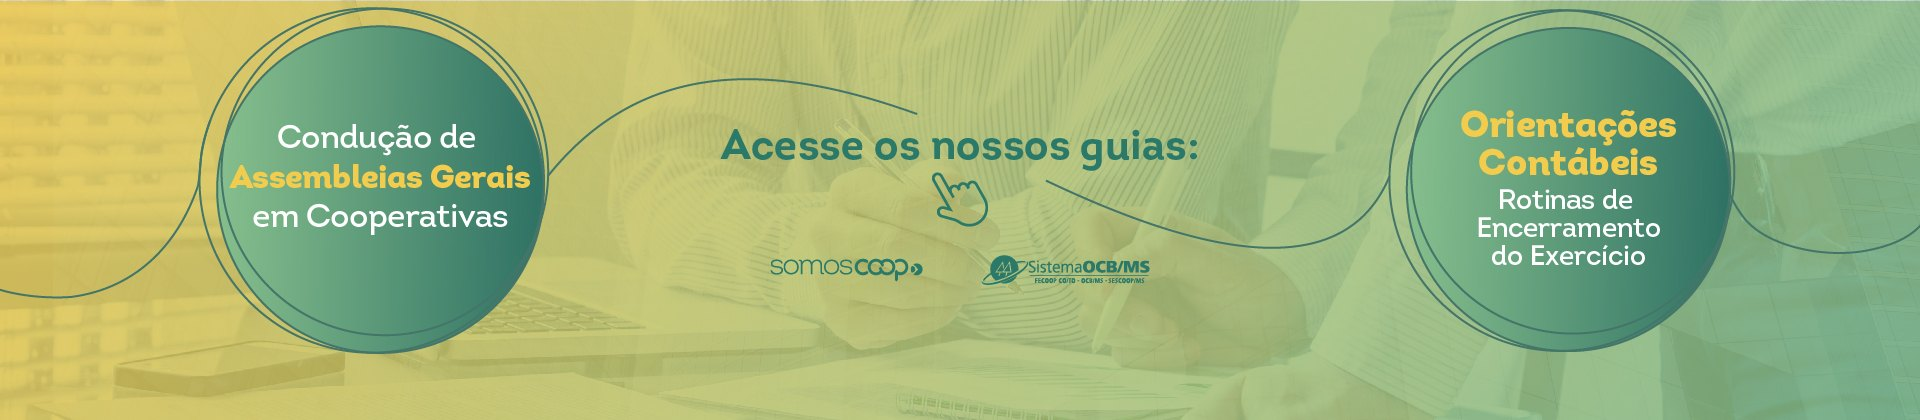 guias_banner-01